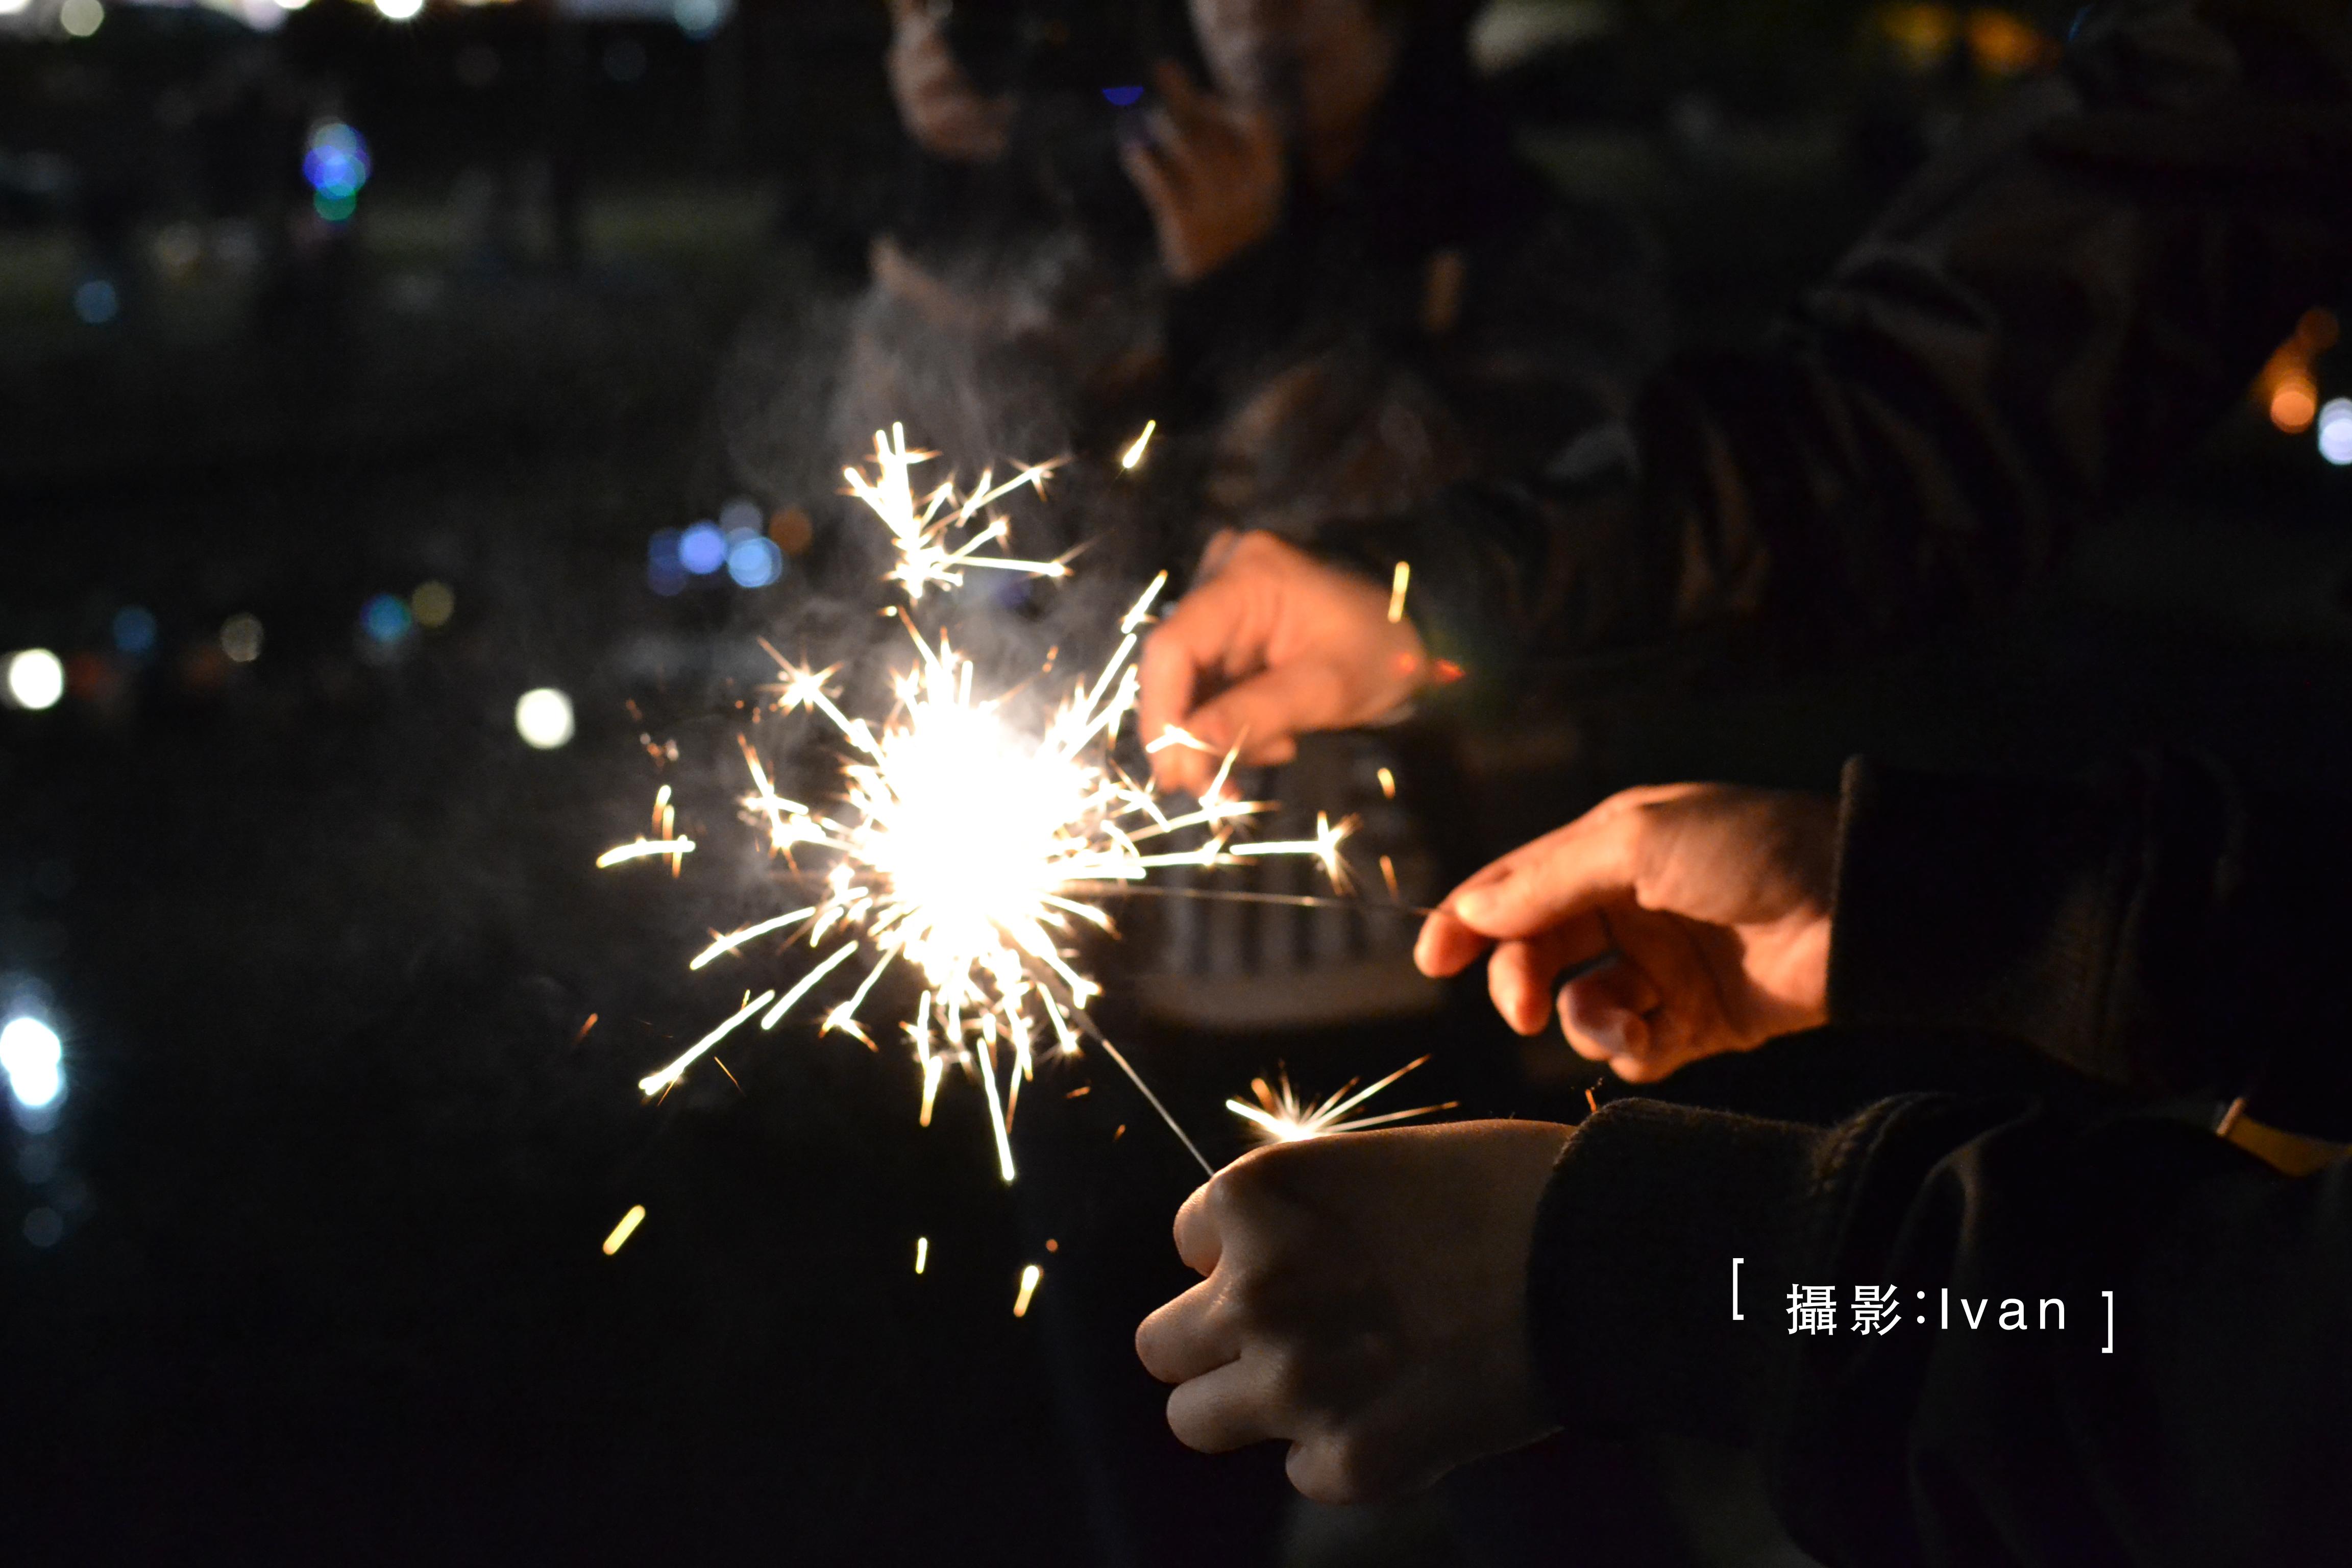 http://ubeat.com.cuhk.edu.hk/wp-content/uploads/2018/141_photos_15.jpg